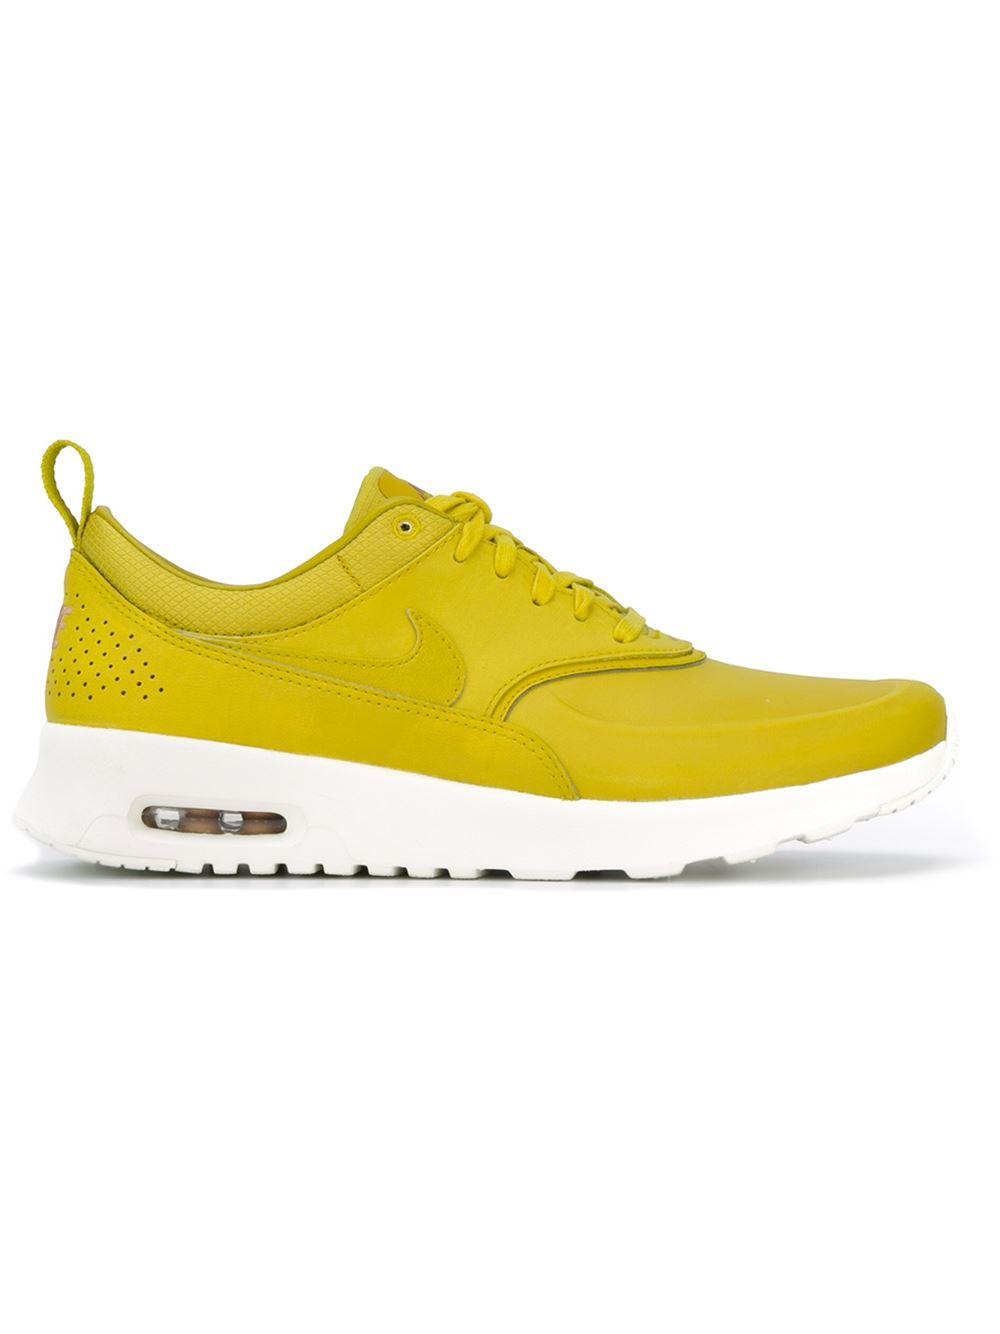 nike yellow 39 air max thea premium 39 sneakers lyst. Black Bedroom Furniture Sets. Home Design Ideas